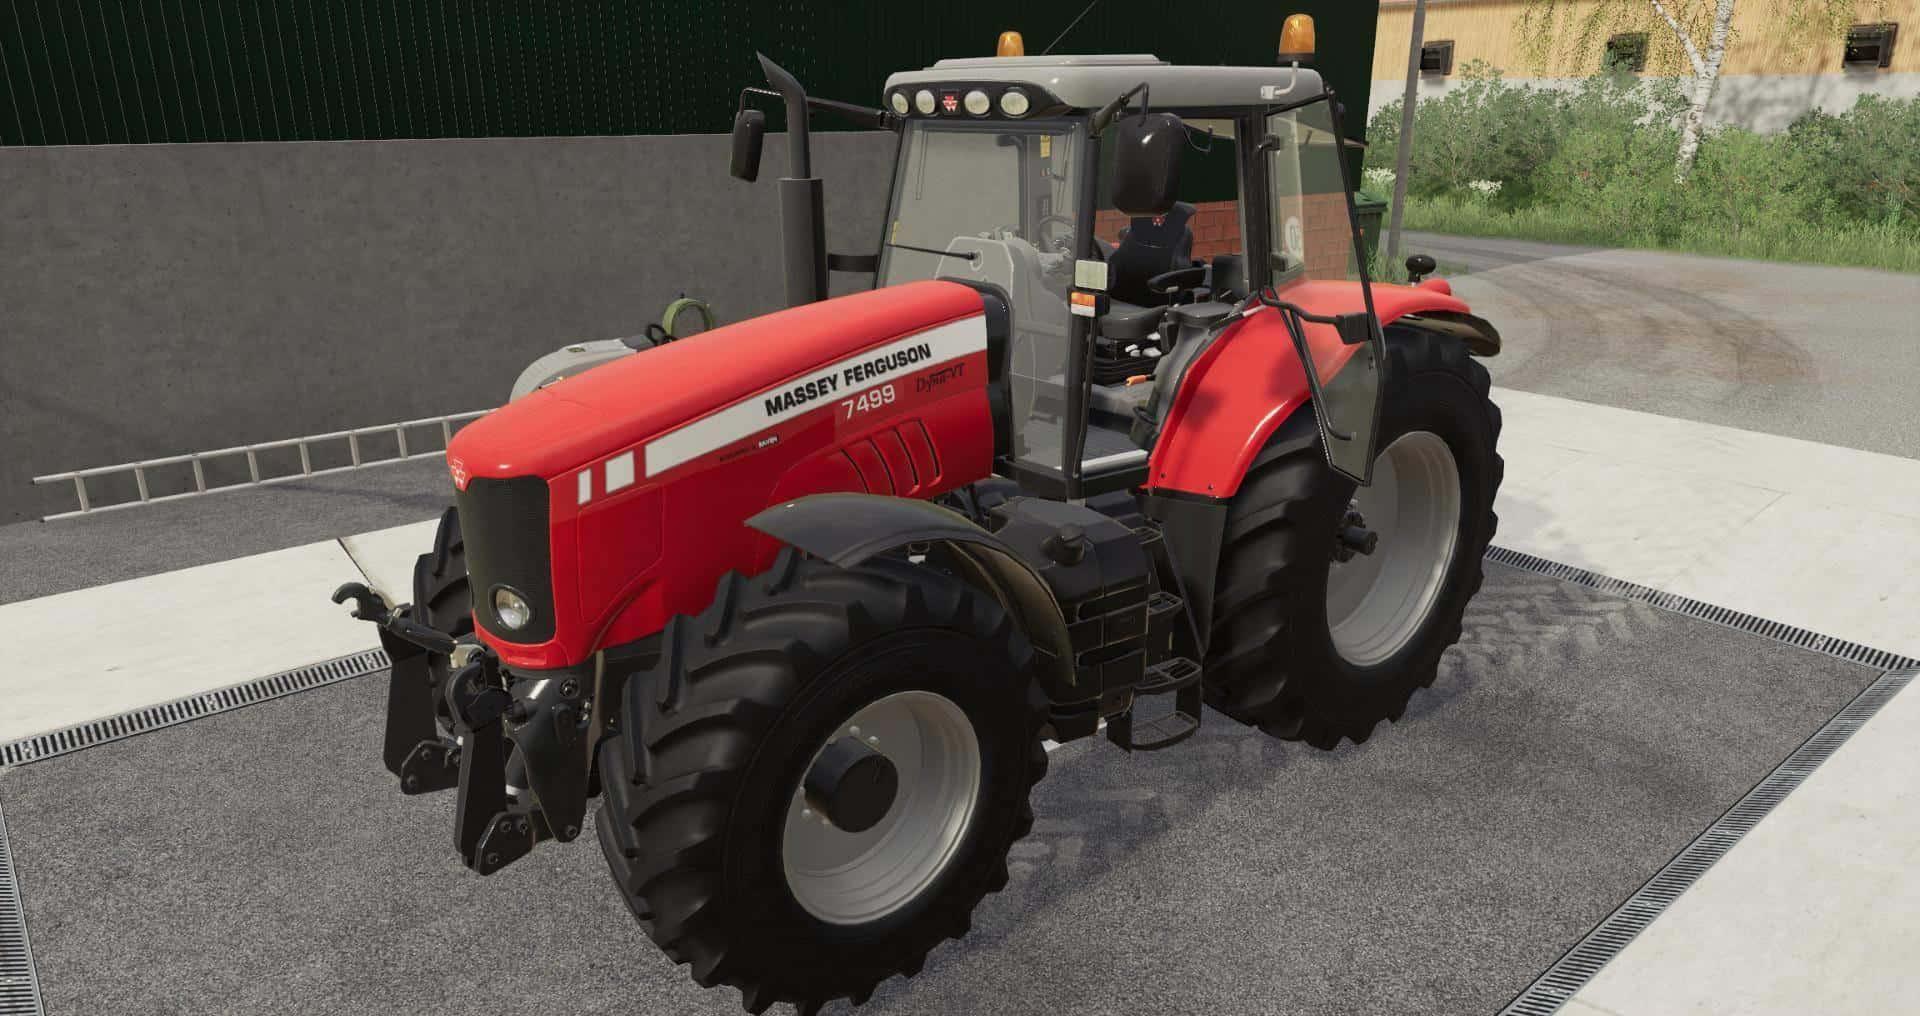 FS19 - Massey Ferguson 7400 Tractor V1.0